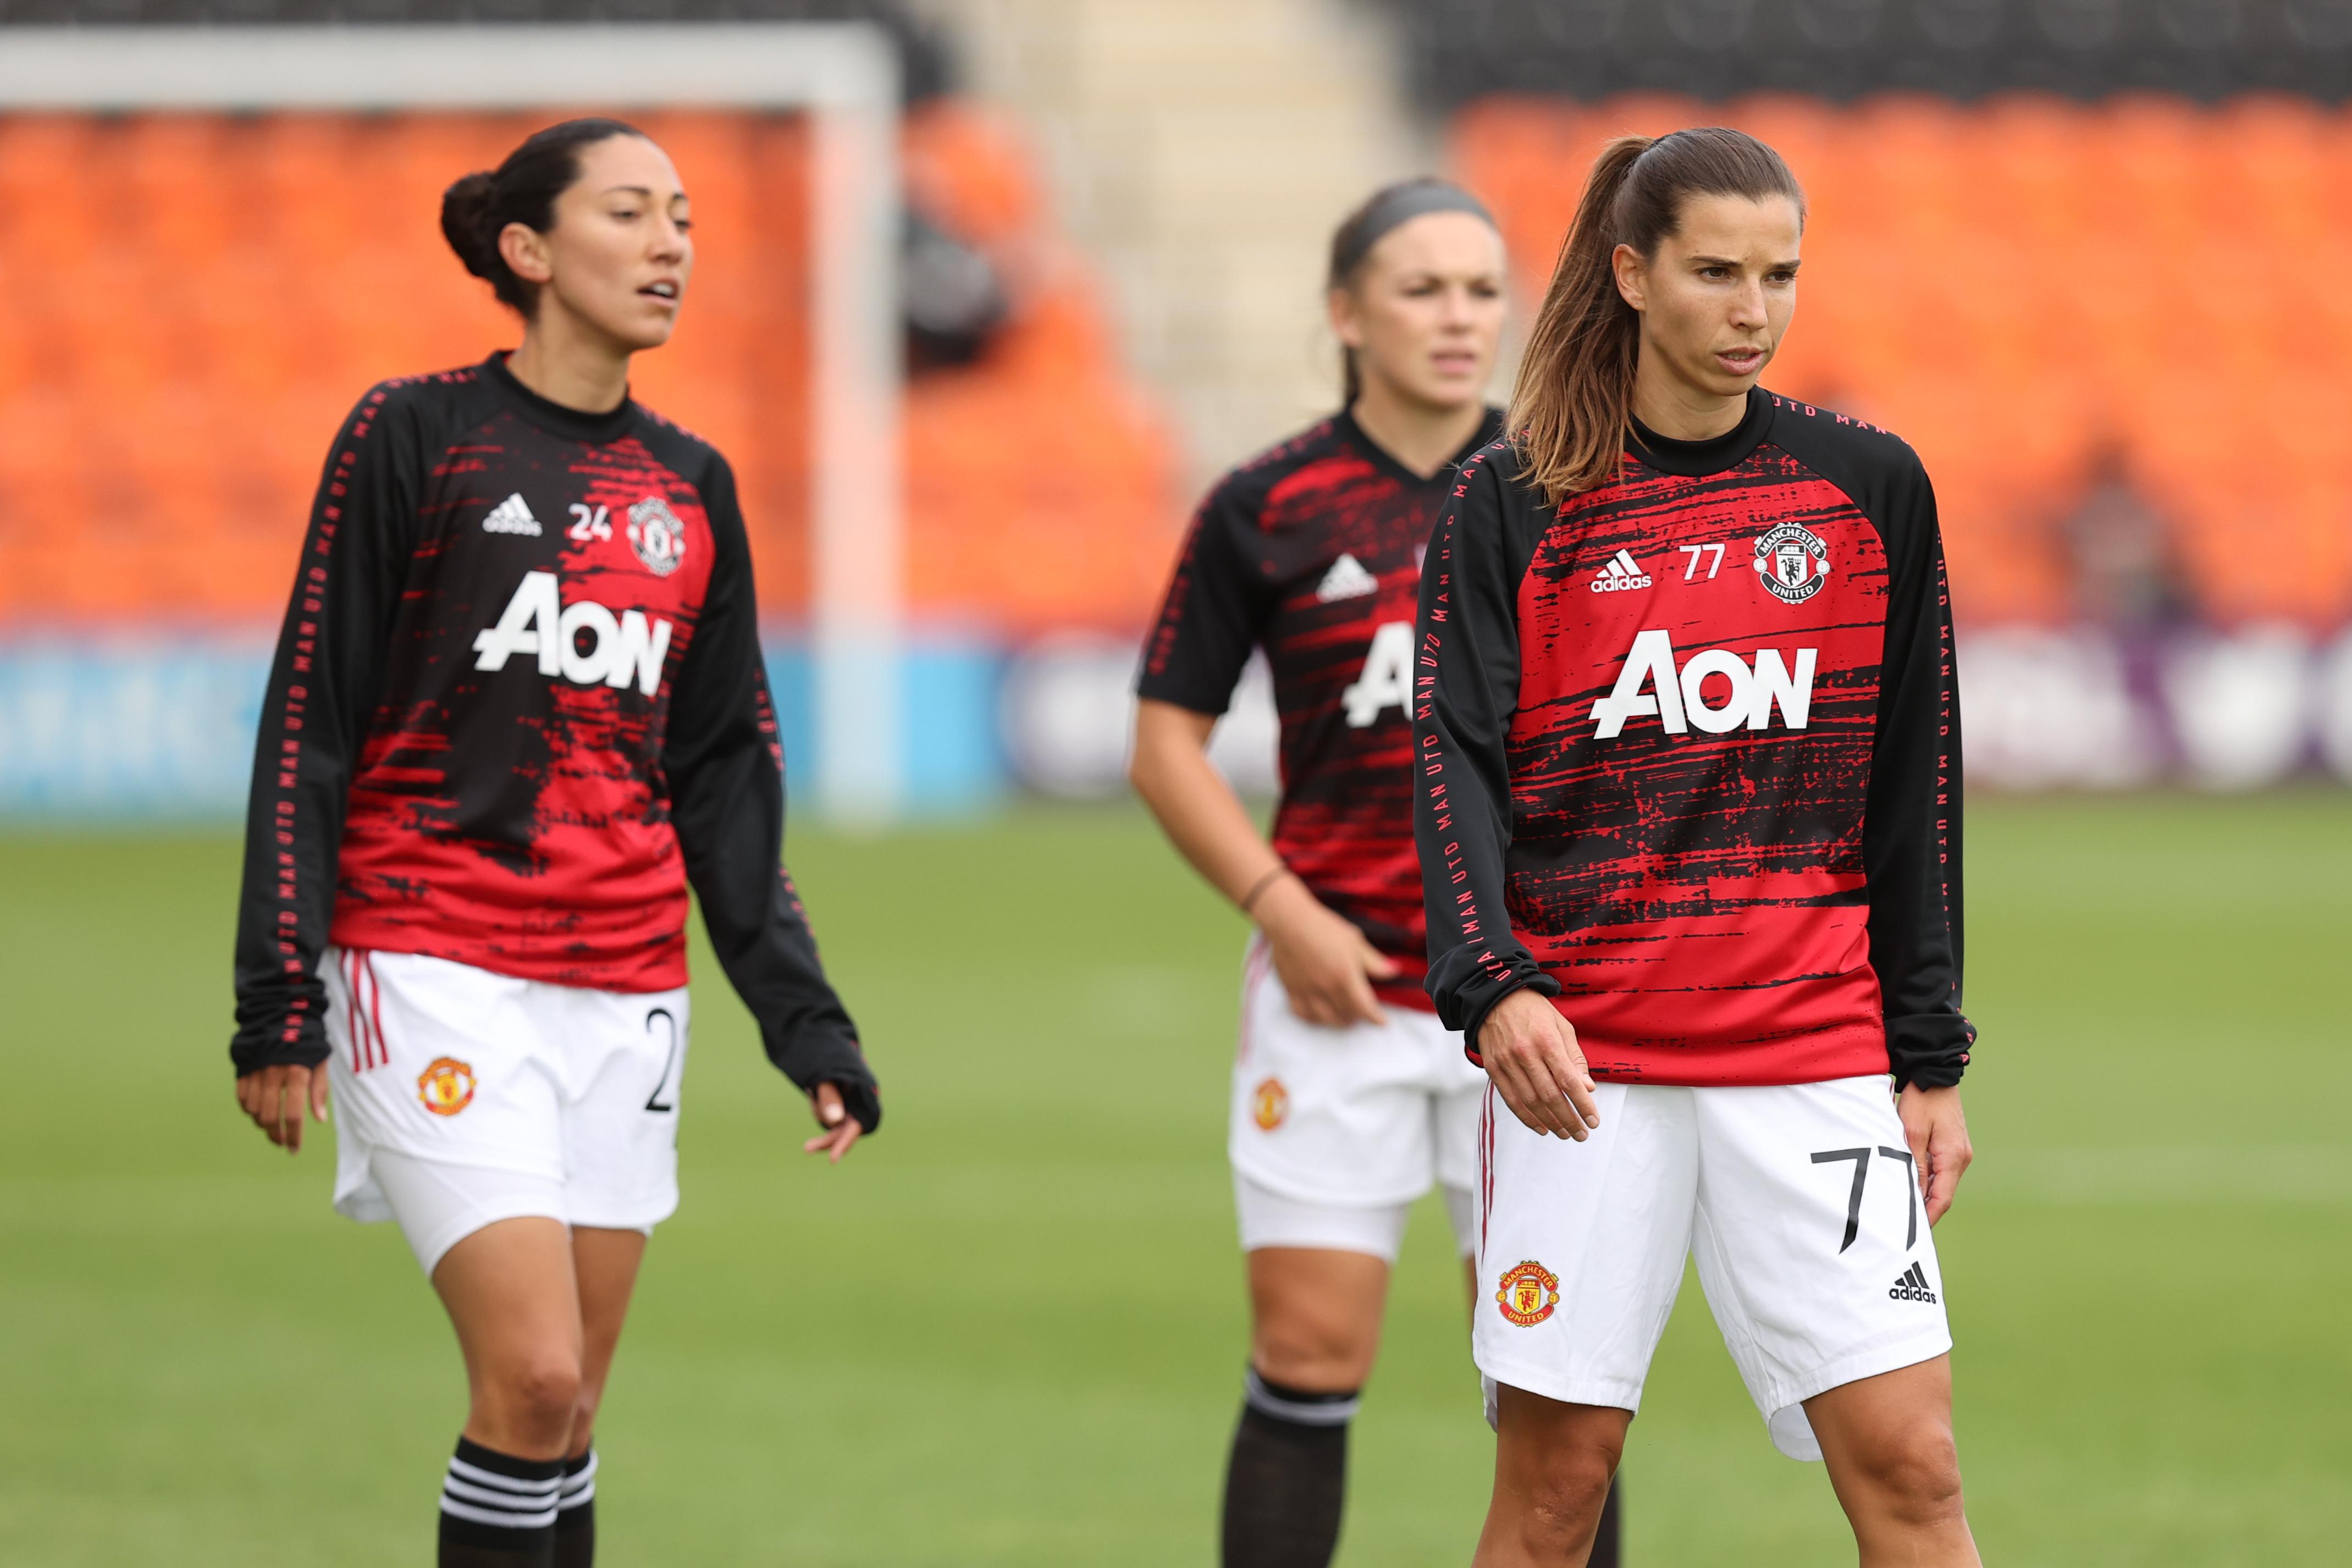 Tottenham Hotspur Women v Manchester United Women - Barclays FA Women's Super League